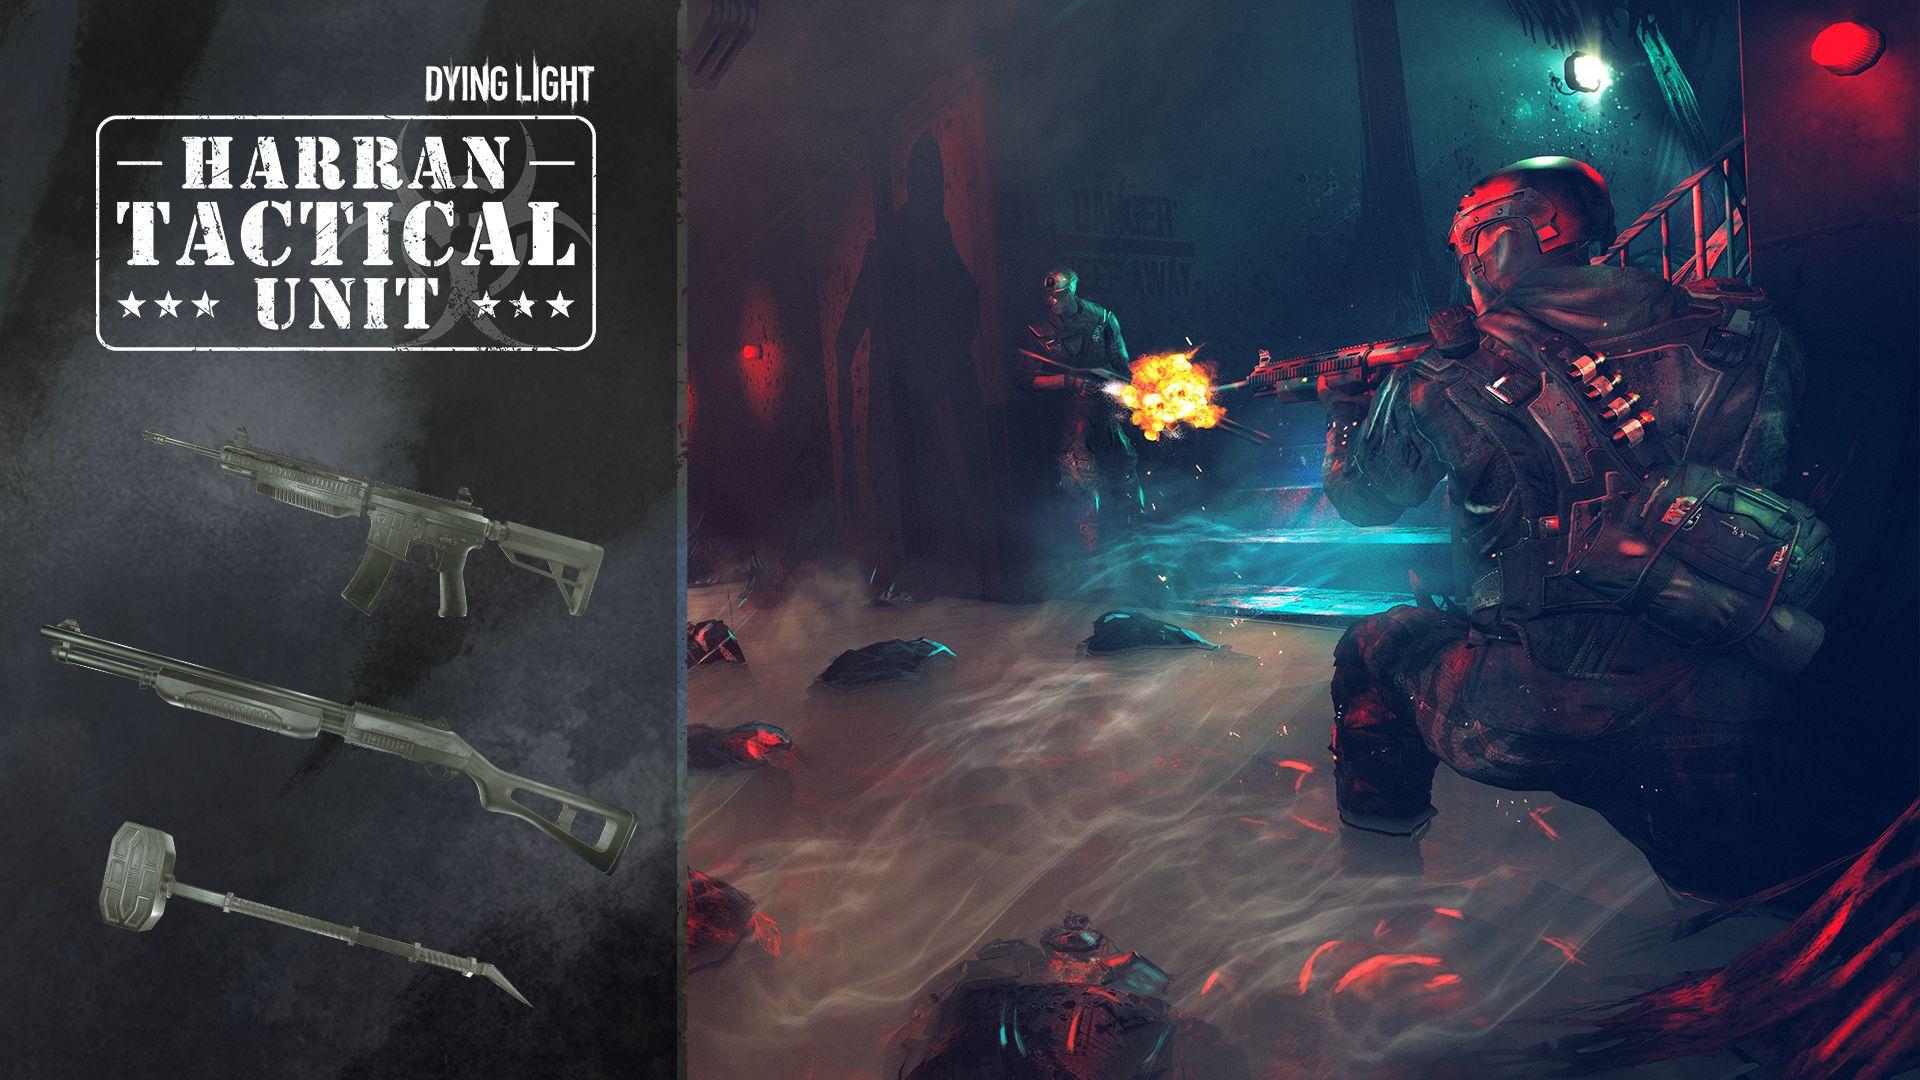 Dying Light - Harran Tactical Unit Bundle   WW (76e493c3-eff8-4ae6-9bd1-3e955ba076dc)